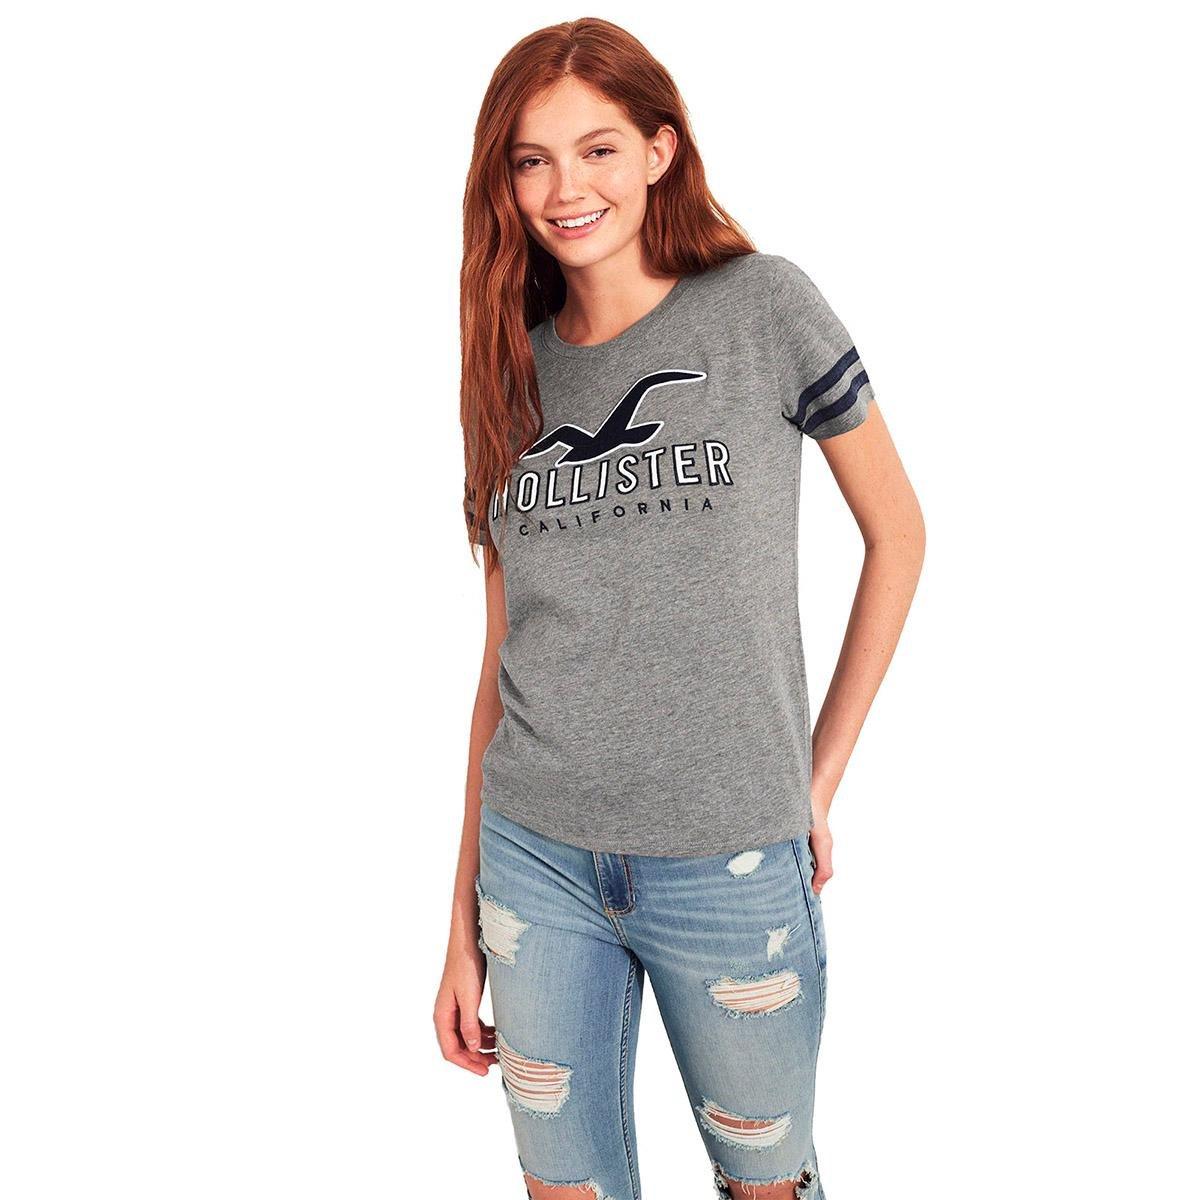 41507112d1 Camiseta Hollister Gráfica Feminina - Cinza - Compre Agora